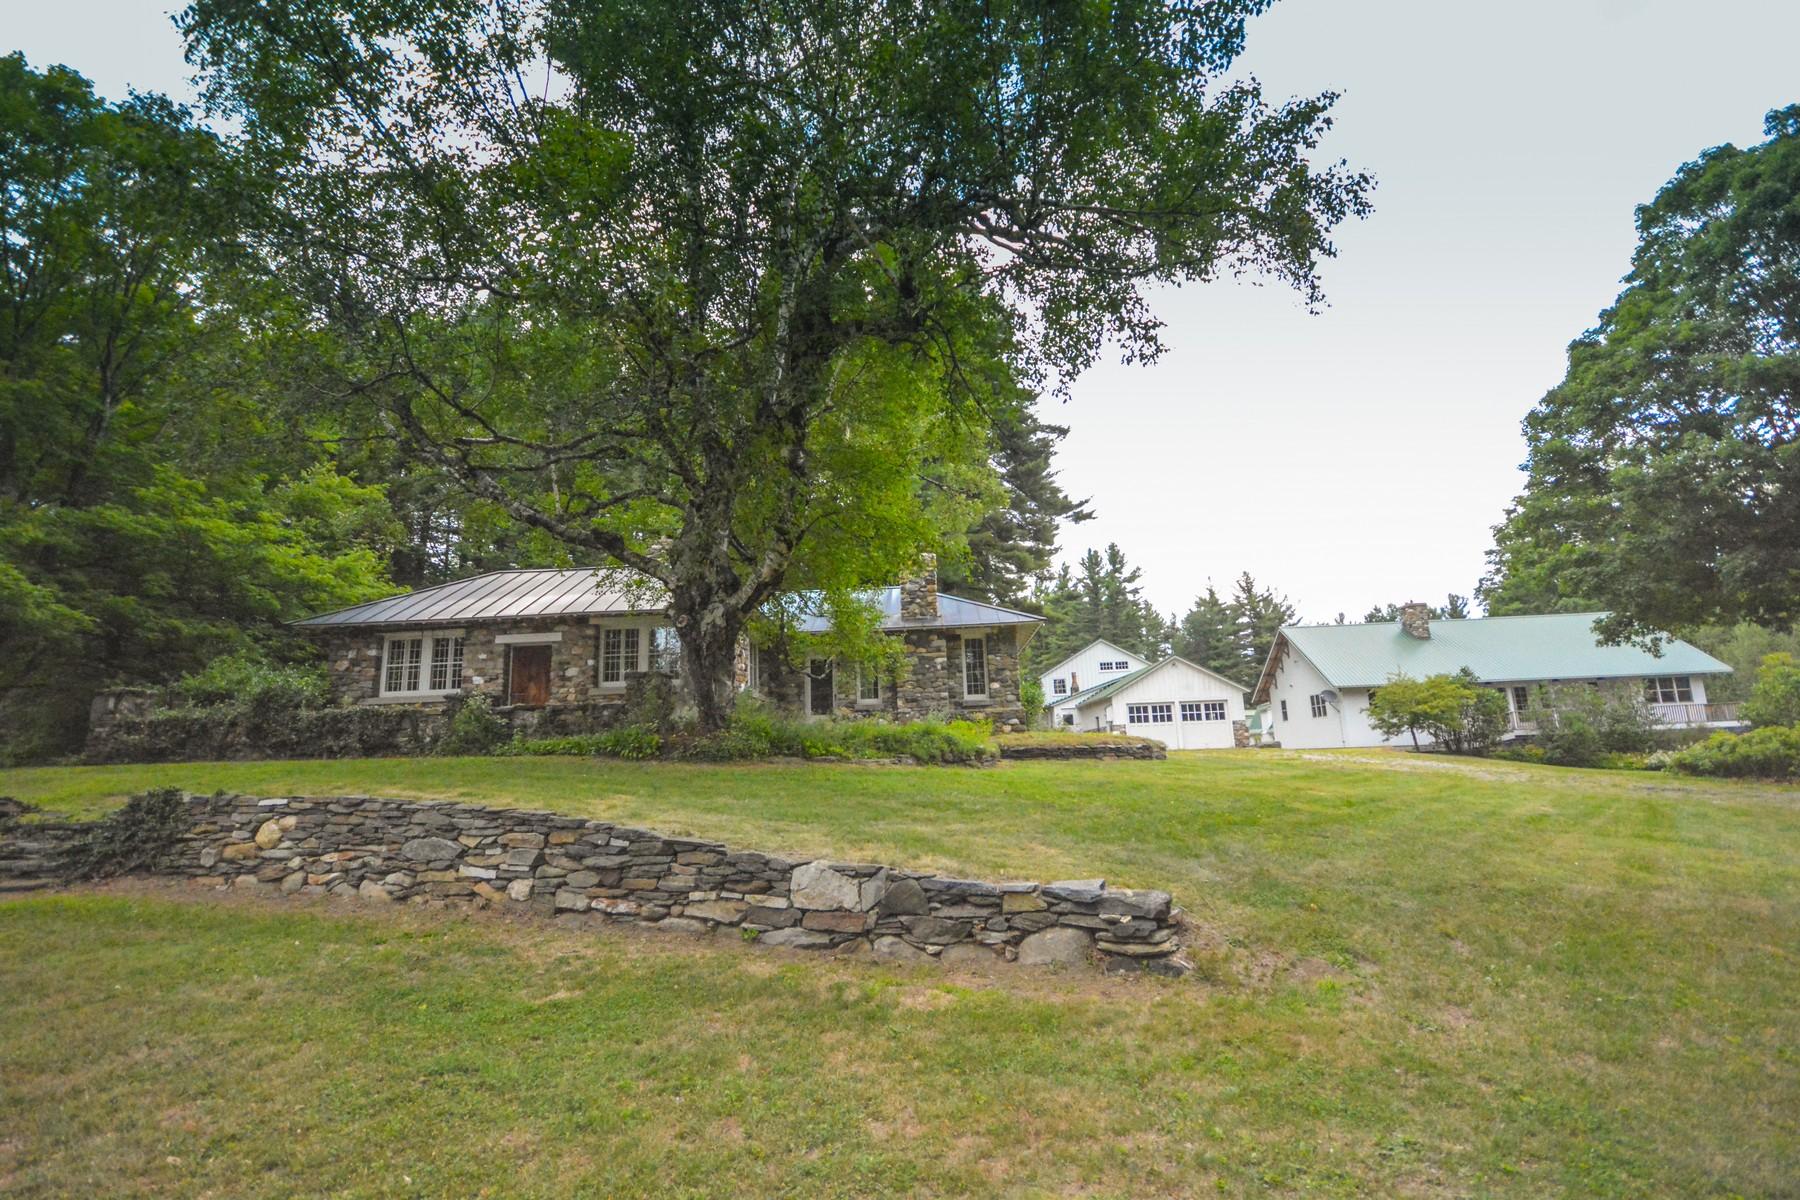 Casa para uma família para Venda às Refinement and Privacy in Marlboro 348 Staver Rd Marlboro, Vermont, 05344 Estados Unidos